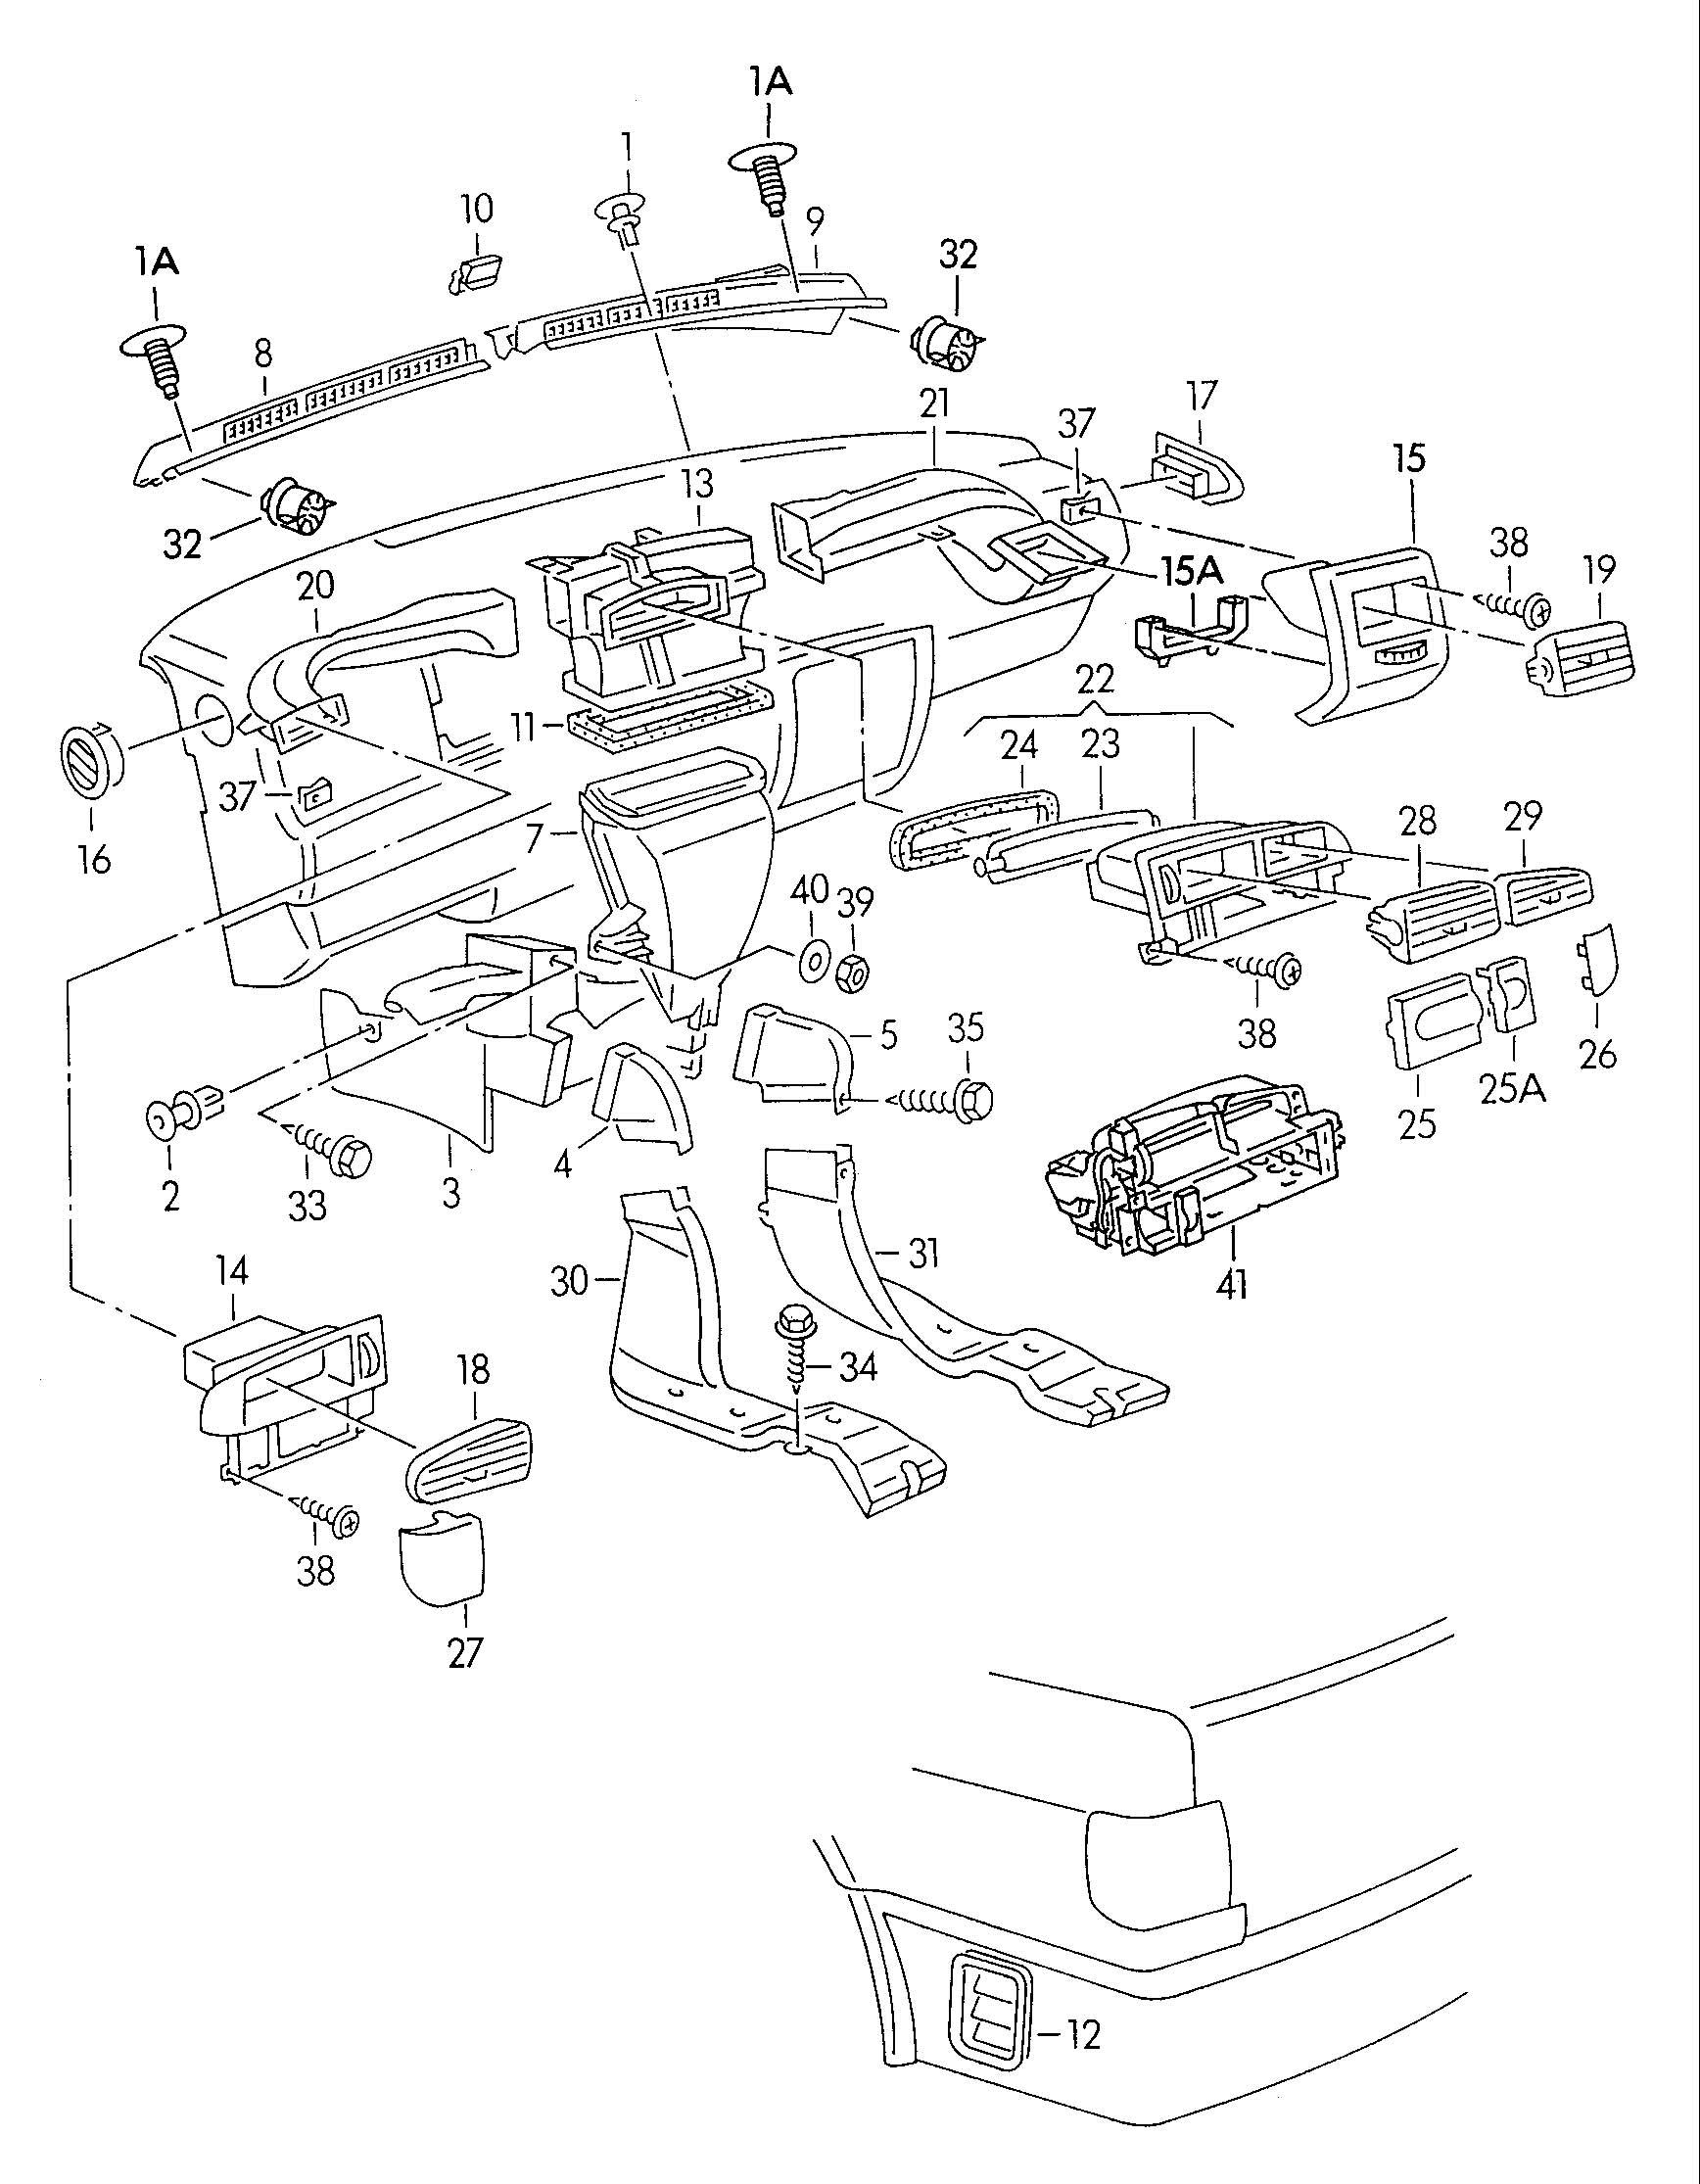 1988 vw cabriolet wiring diagram